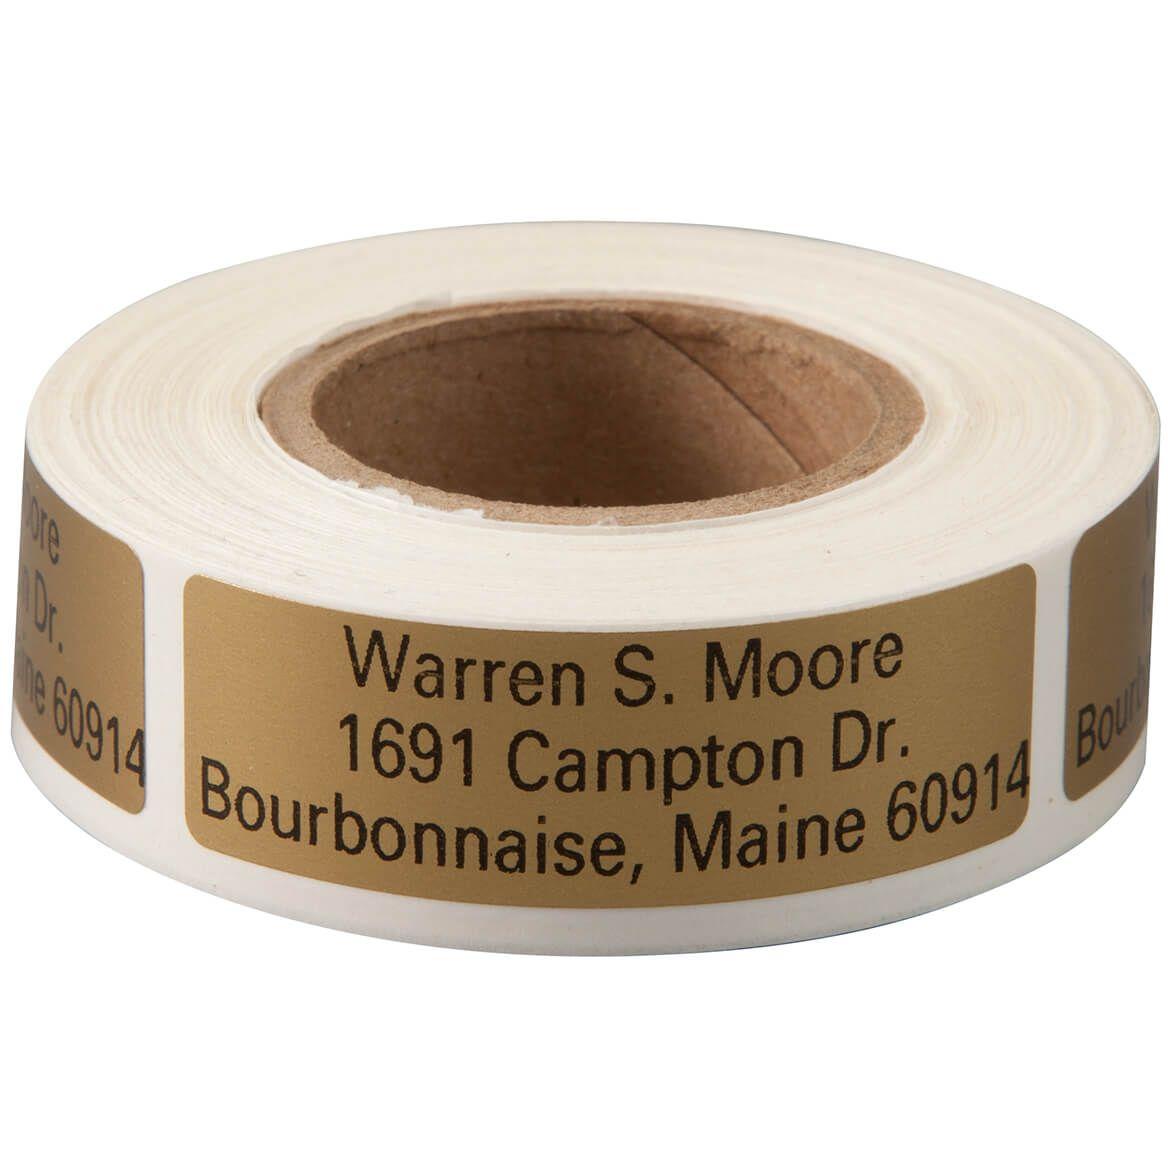 Large Print Self-Stick Address Labels - Roll of 200-357460